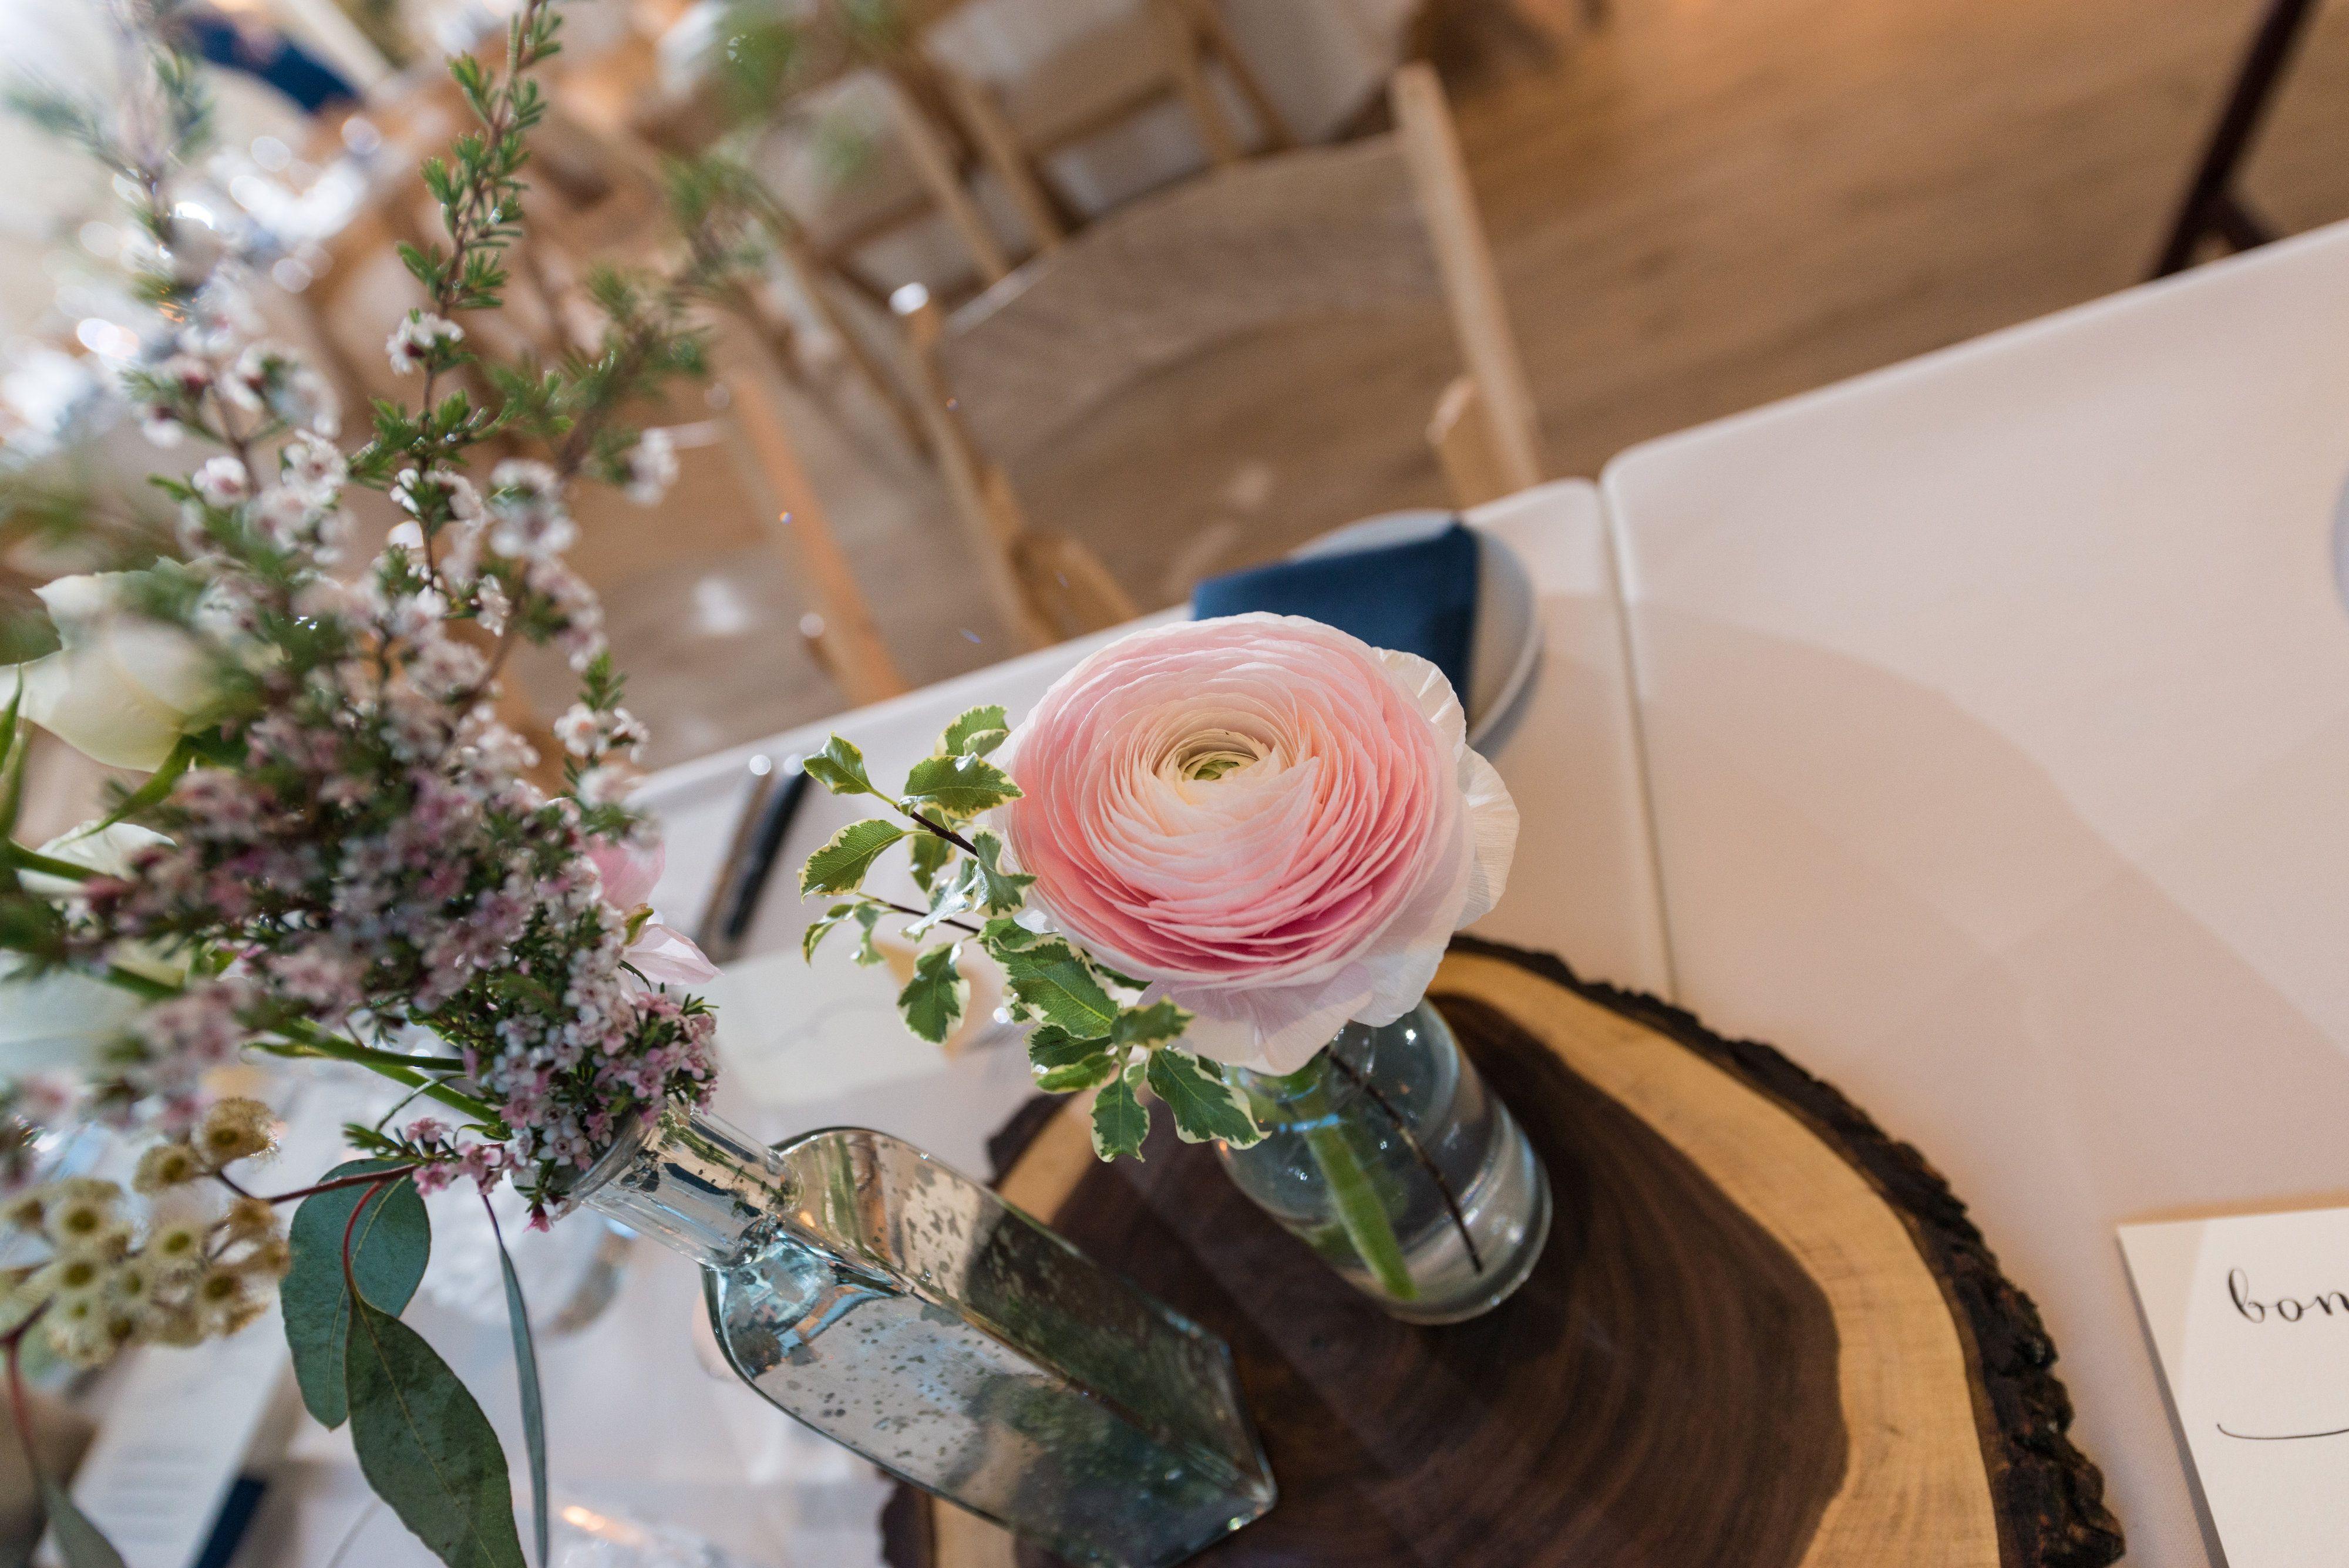 #FabFloraChicago #Jennography #WeddingFlowers #GreenhouseLoft #SpringWedding #Centerpieces #Ranunculus #BottlesofBlooms #BlushBlooms #ChicagoWedding